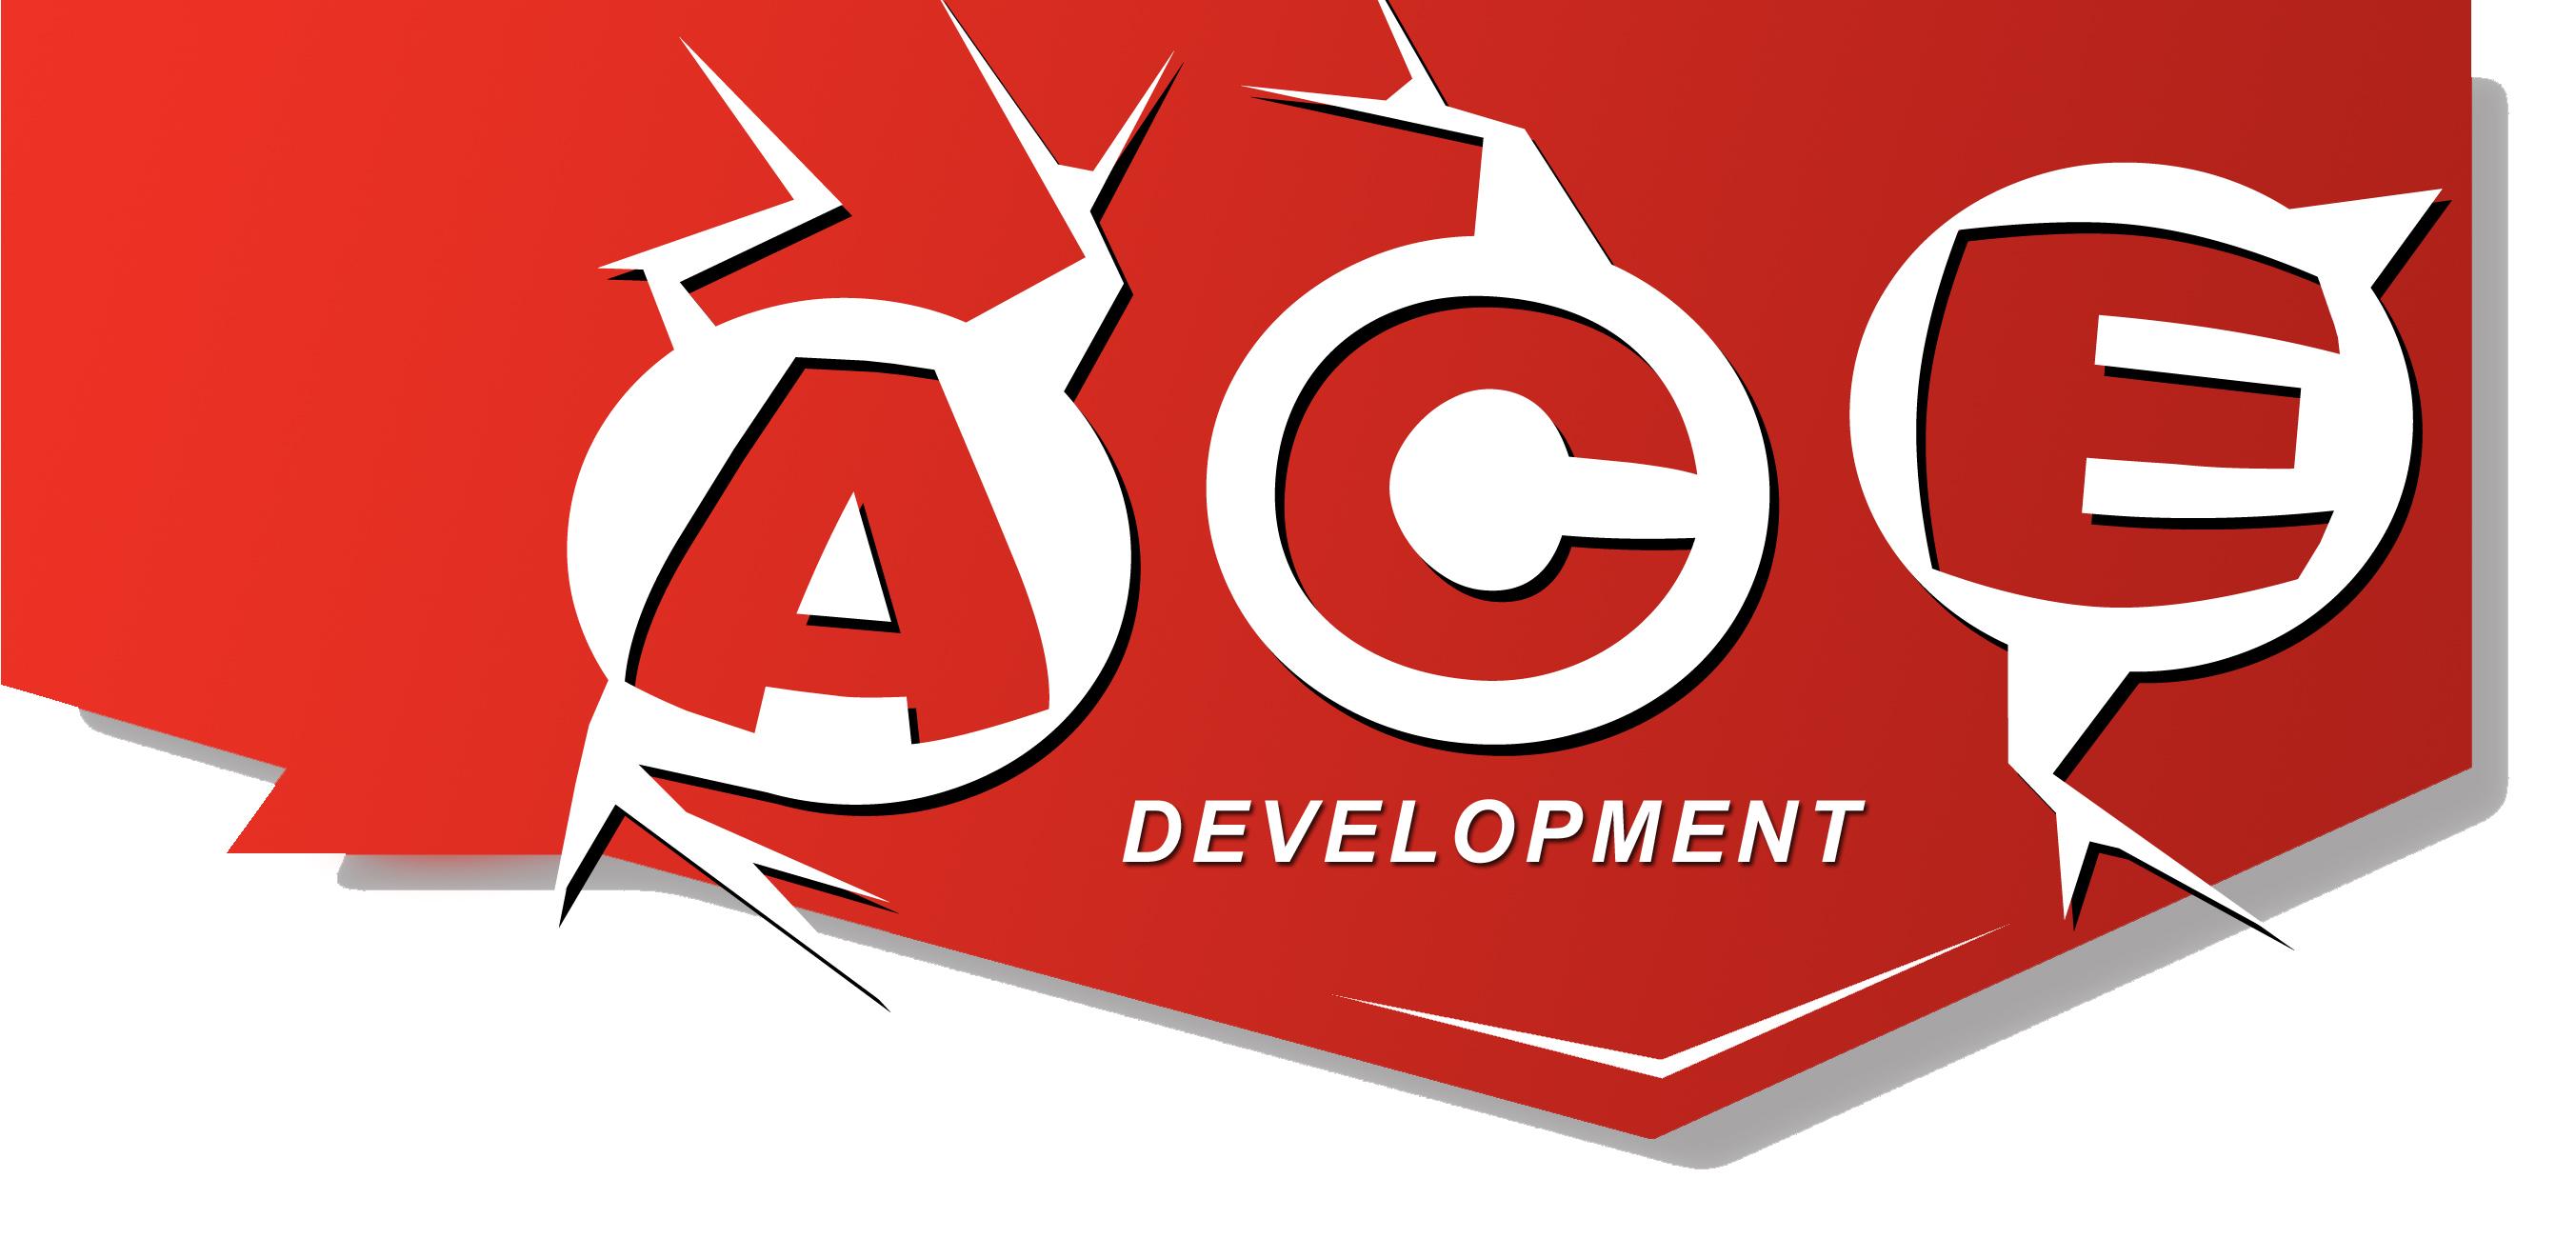 Logo Design by tsyrette - Entry No. 81 in the Logo Design Contest Fun Logo Design for Ace development.